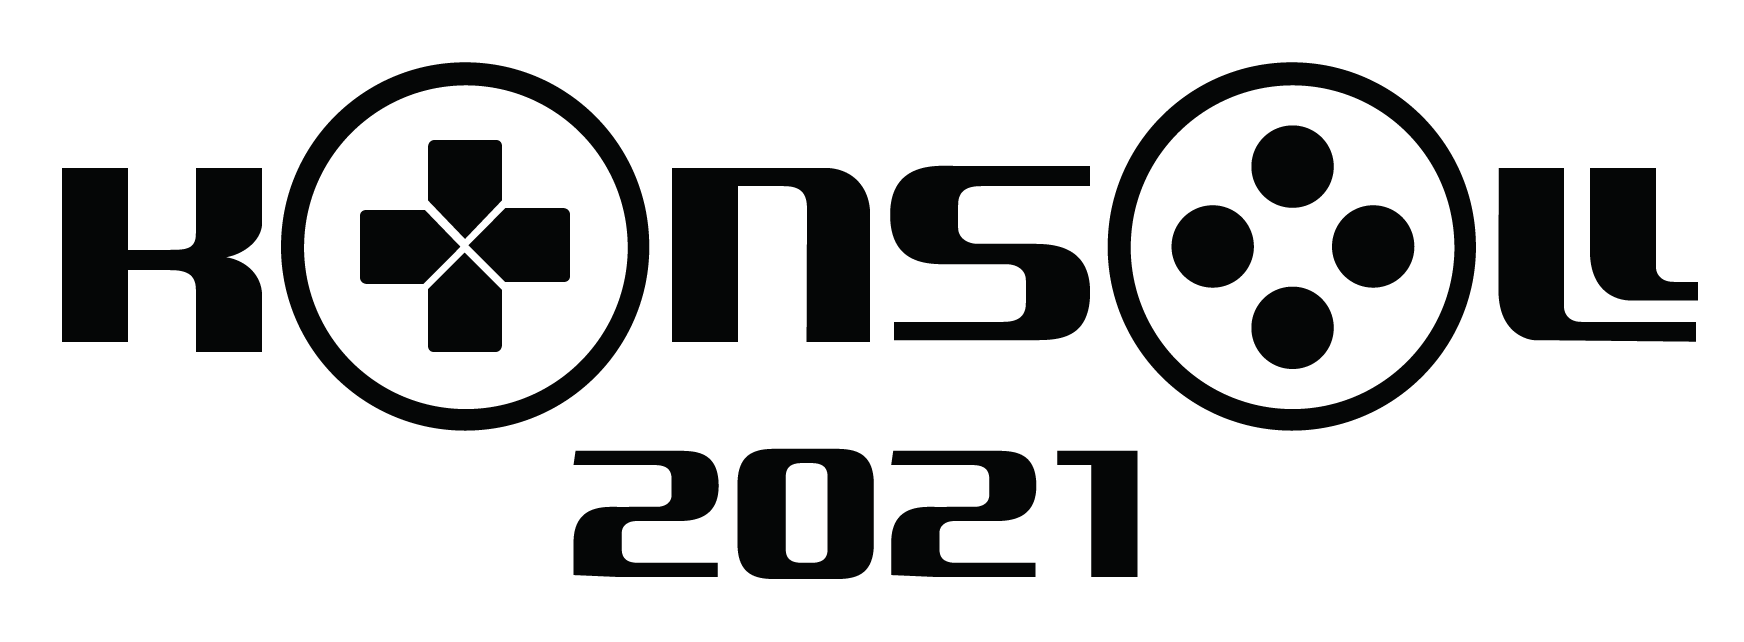 Konsoll 2021